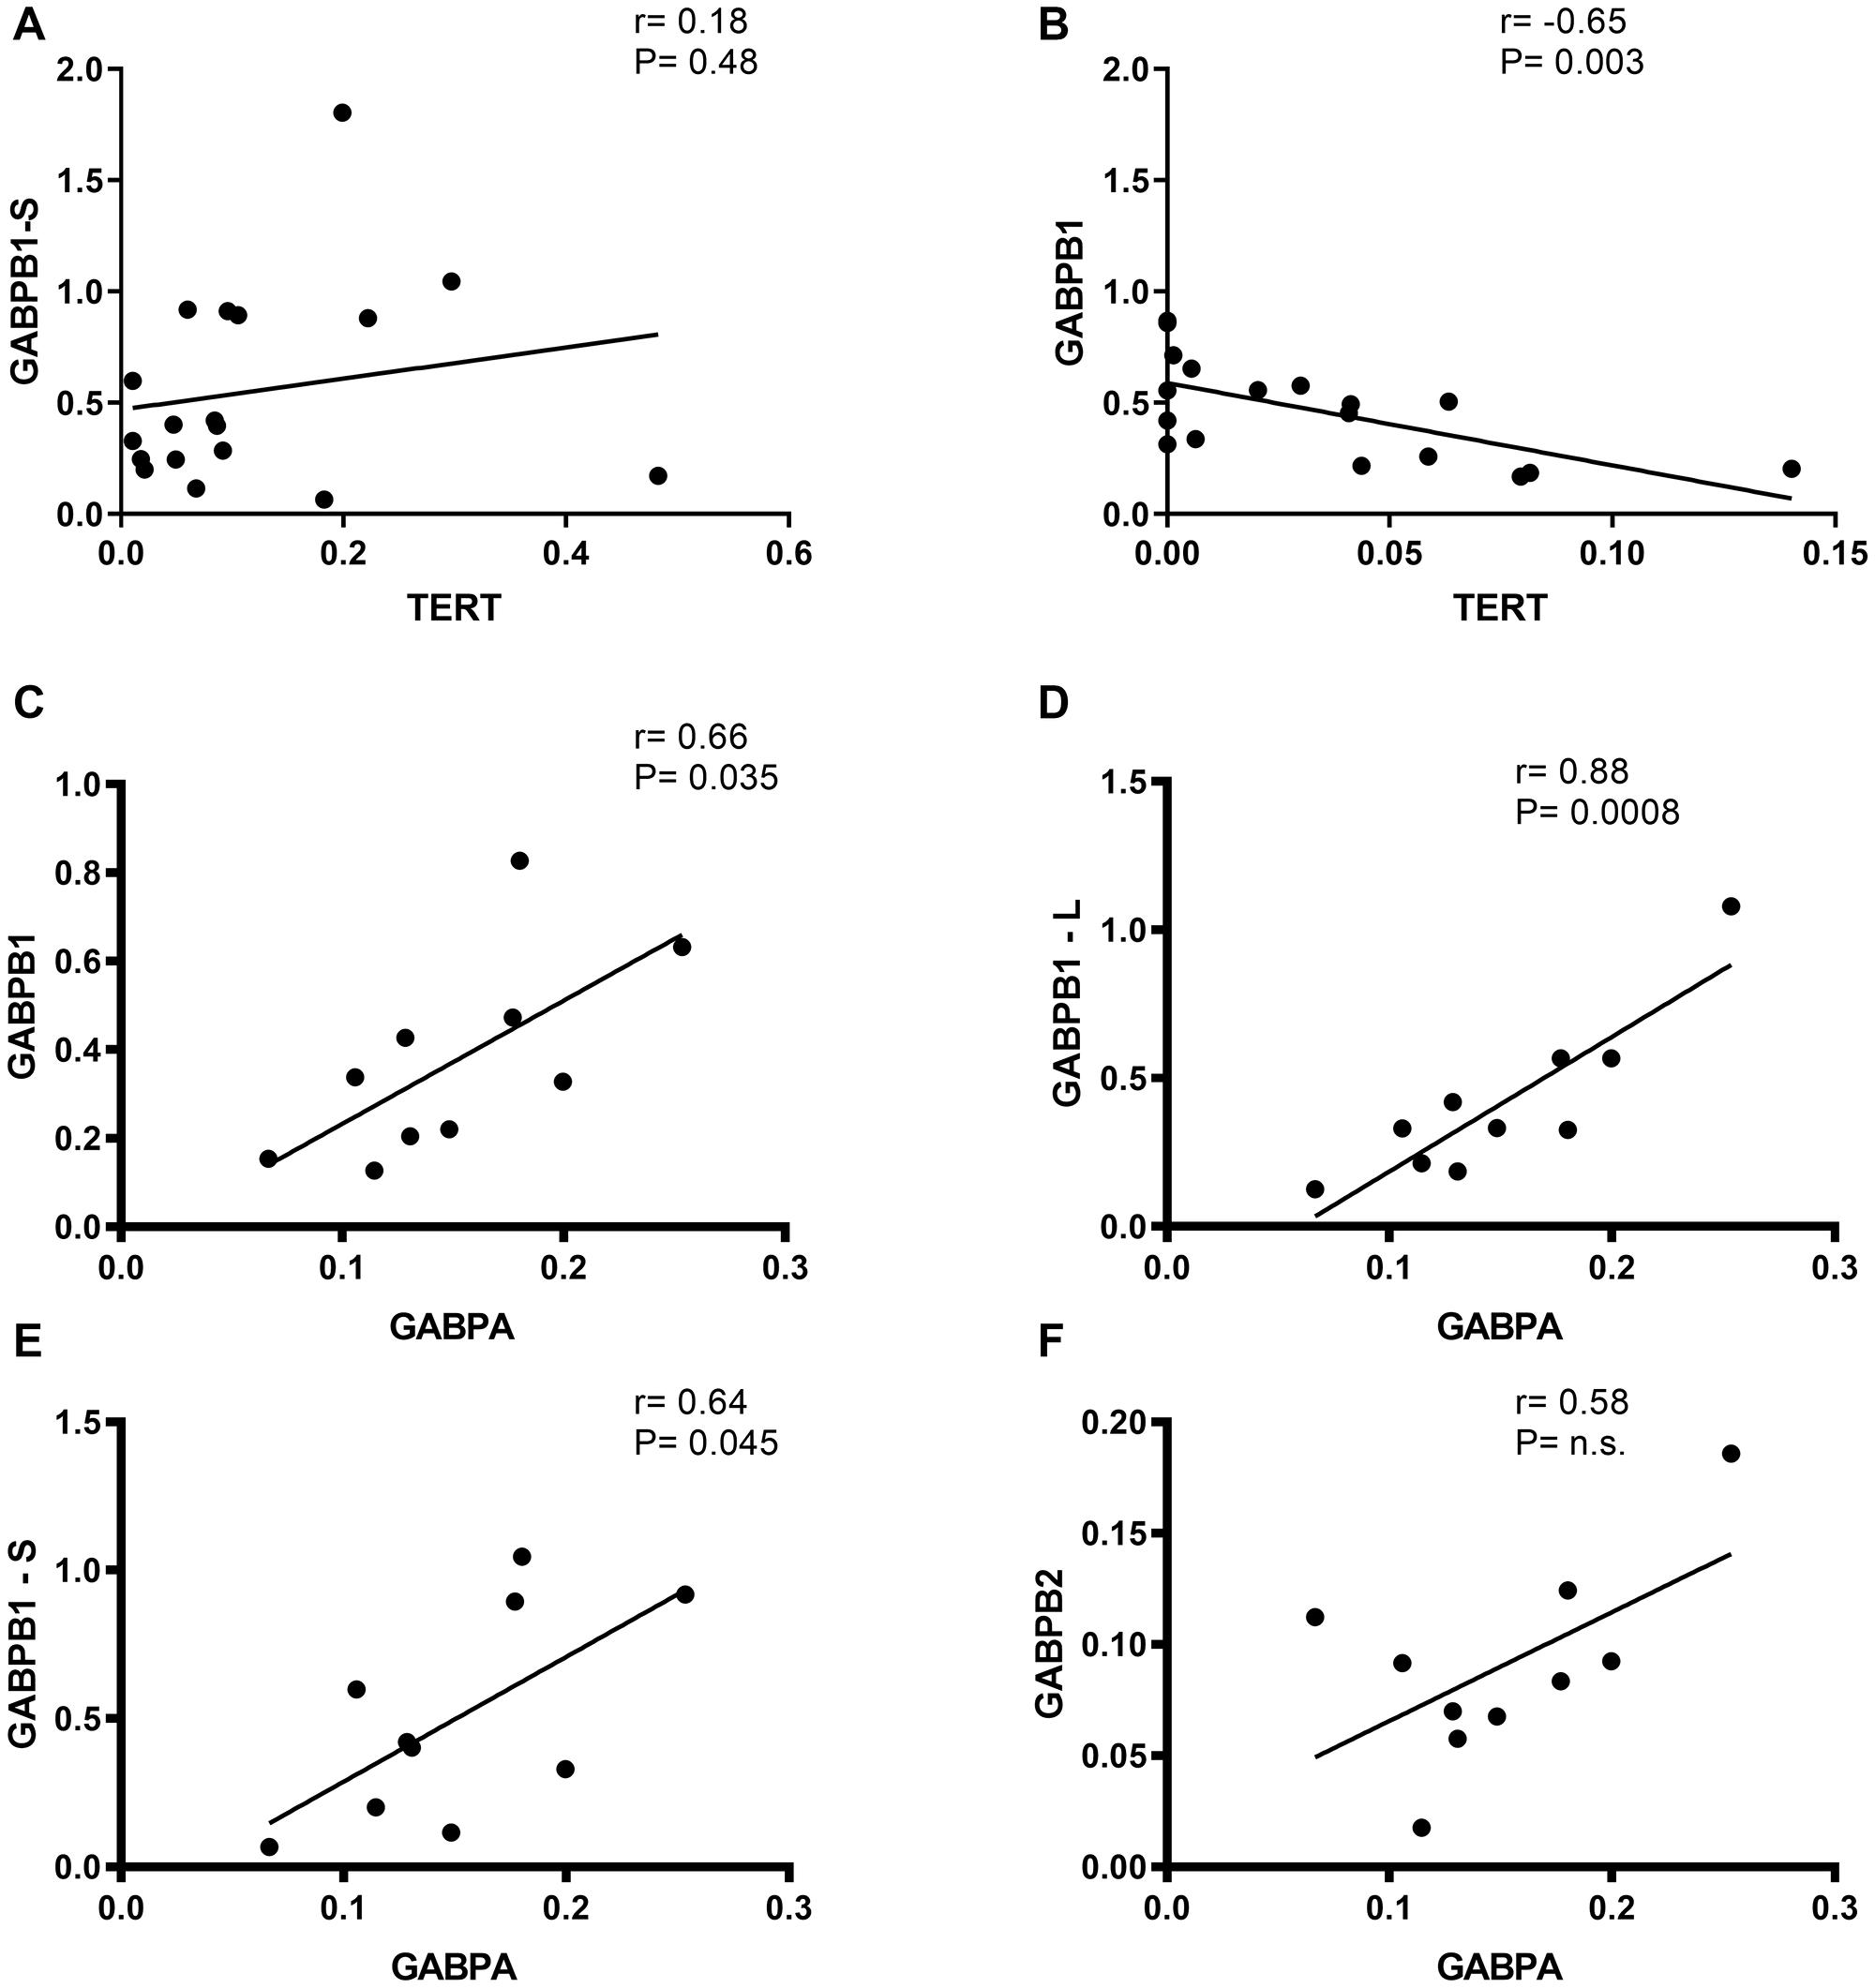 Correlation of TERT vs. GABPB1/-S and GABPB1, GABPB1-L, GABPB1-S and GABPB2 vs. GABPBA mRNA expression in gliomas.